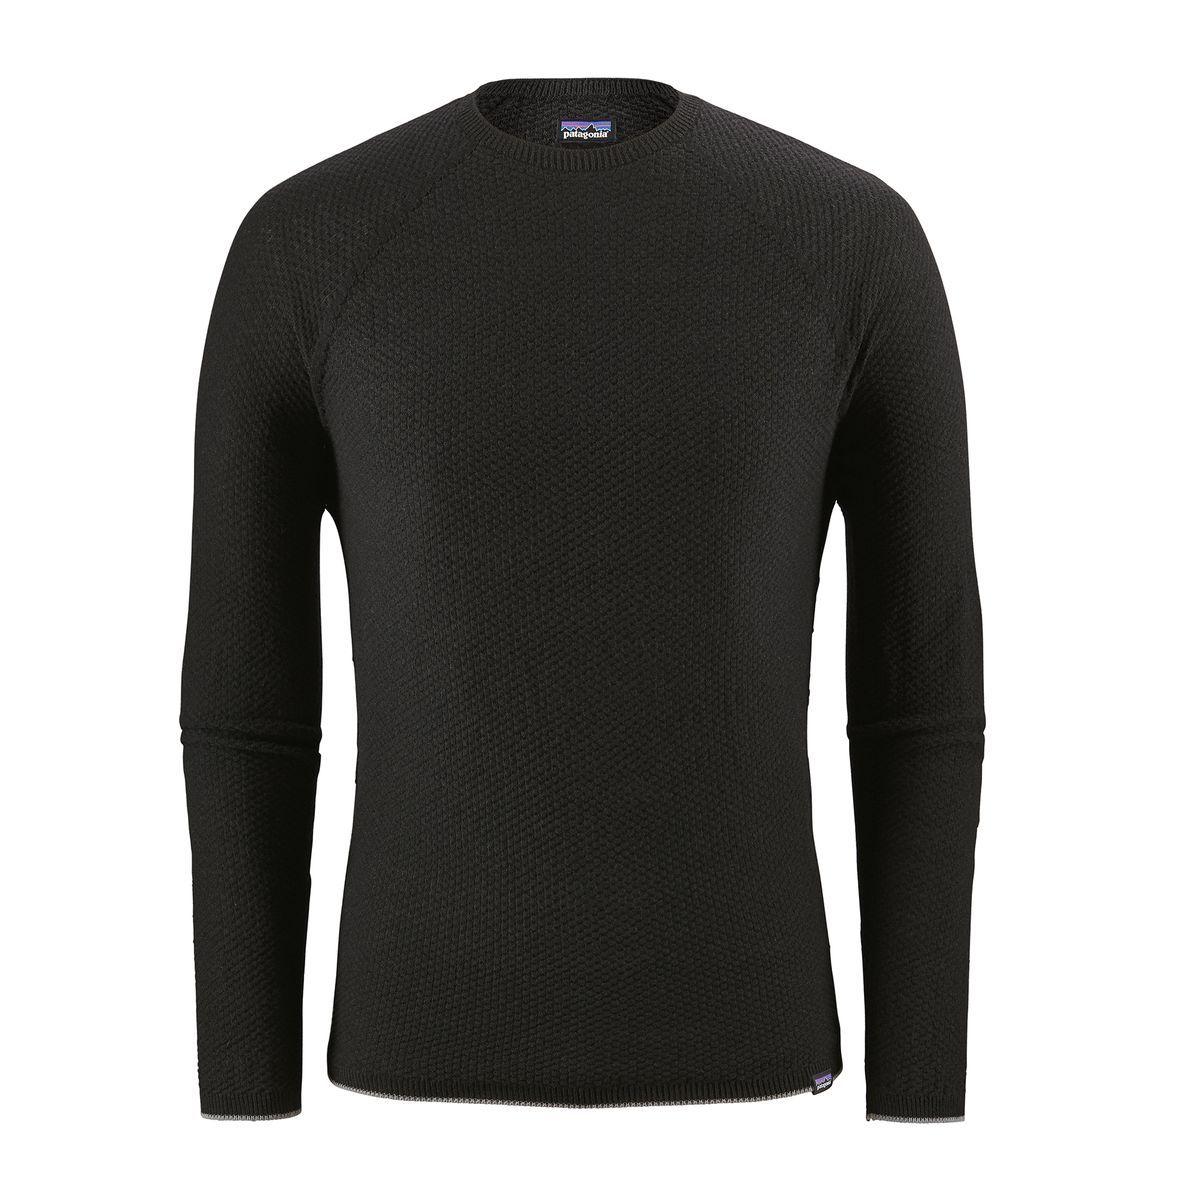 Men's Capilene® Air Crew Outdoor outfit, Crew neck shirt